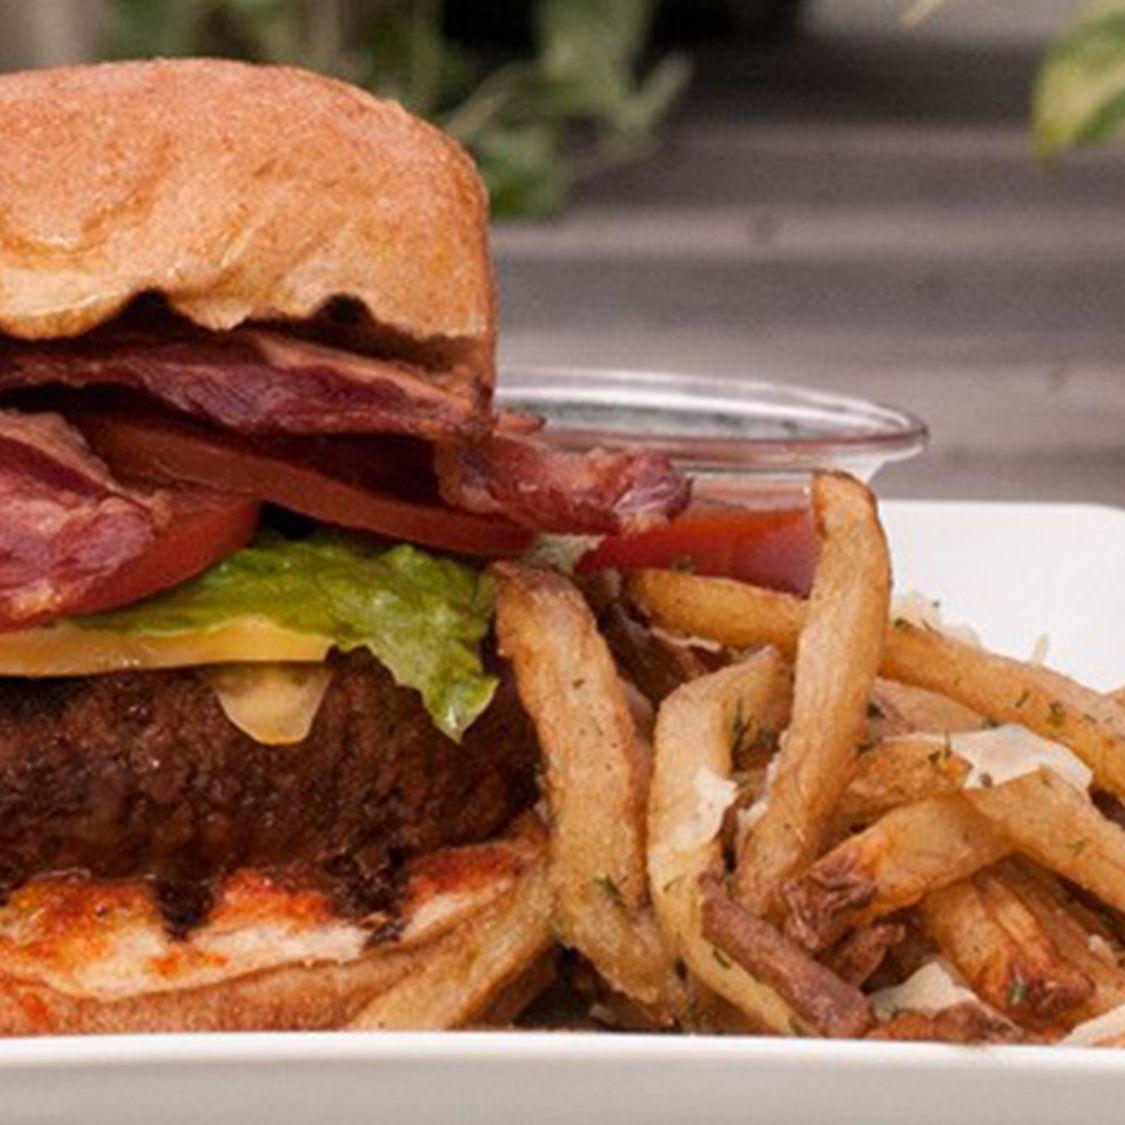 texas_sriracha_burger.jpg